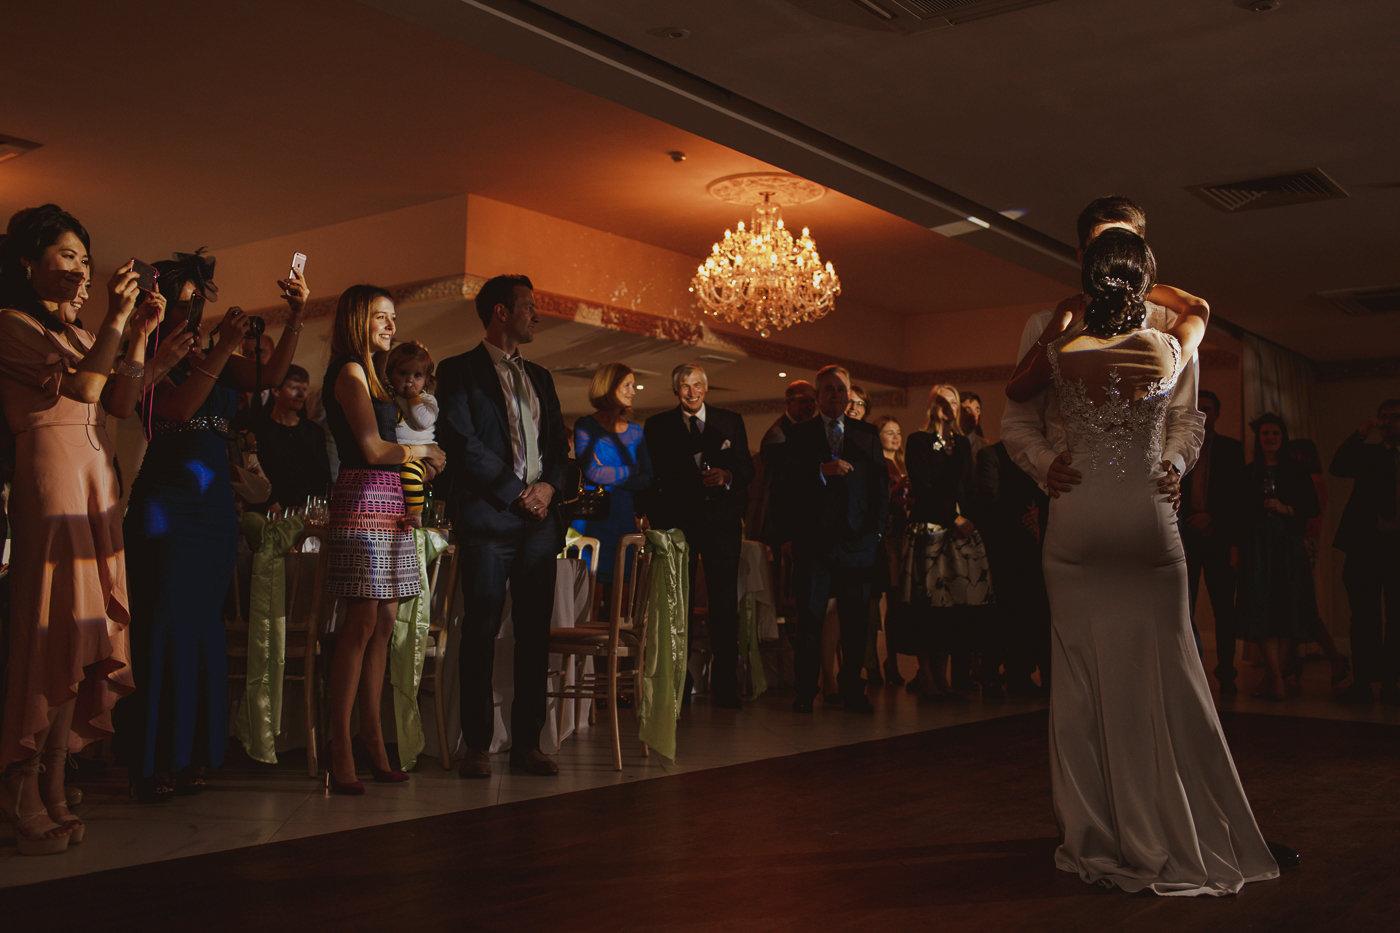 froyle-park-wedding-photography-45.jpg